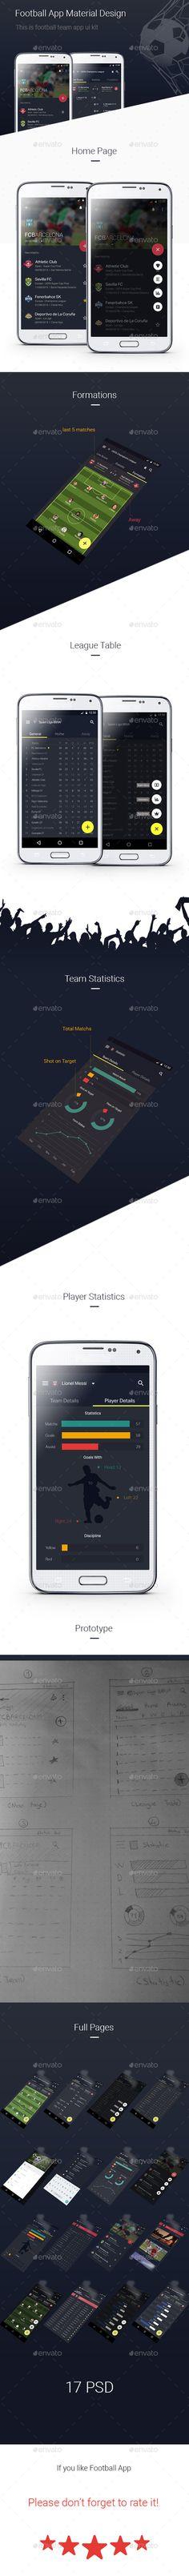 Football App Ui Kit  Material Design #userinterface Download: http://graphicriver.net/item/football-app-ui-kit-material-design/12097670?ref=ksioks